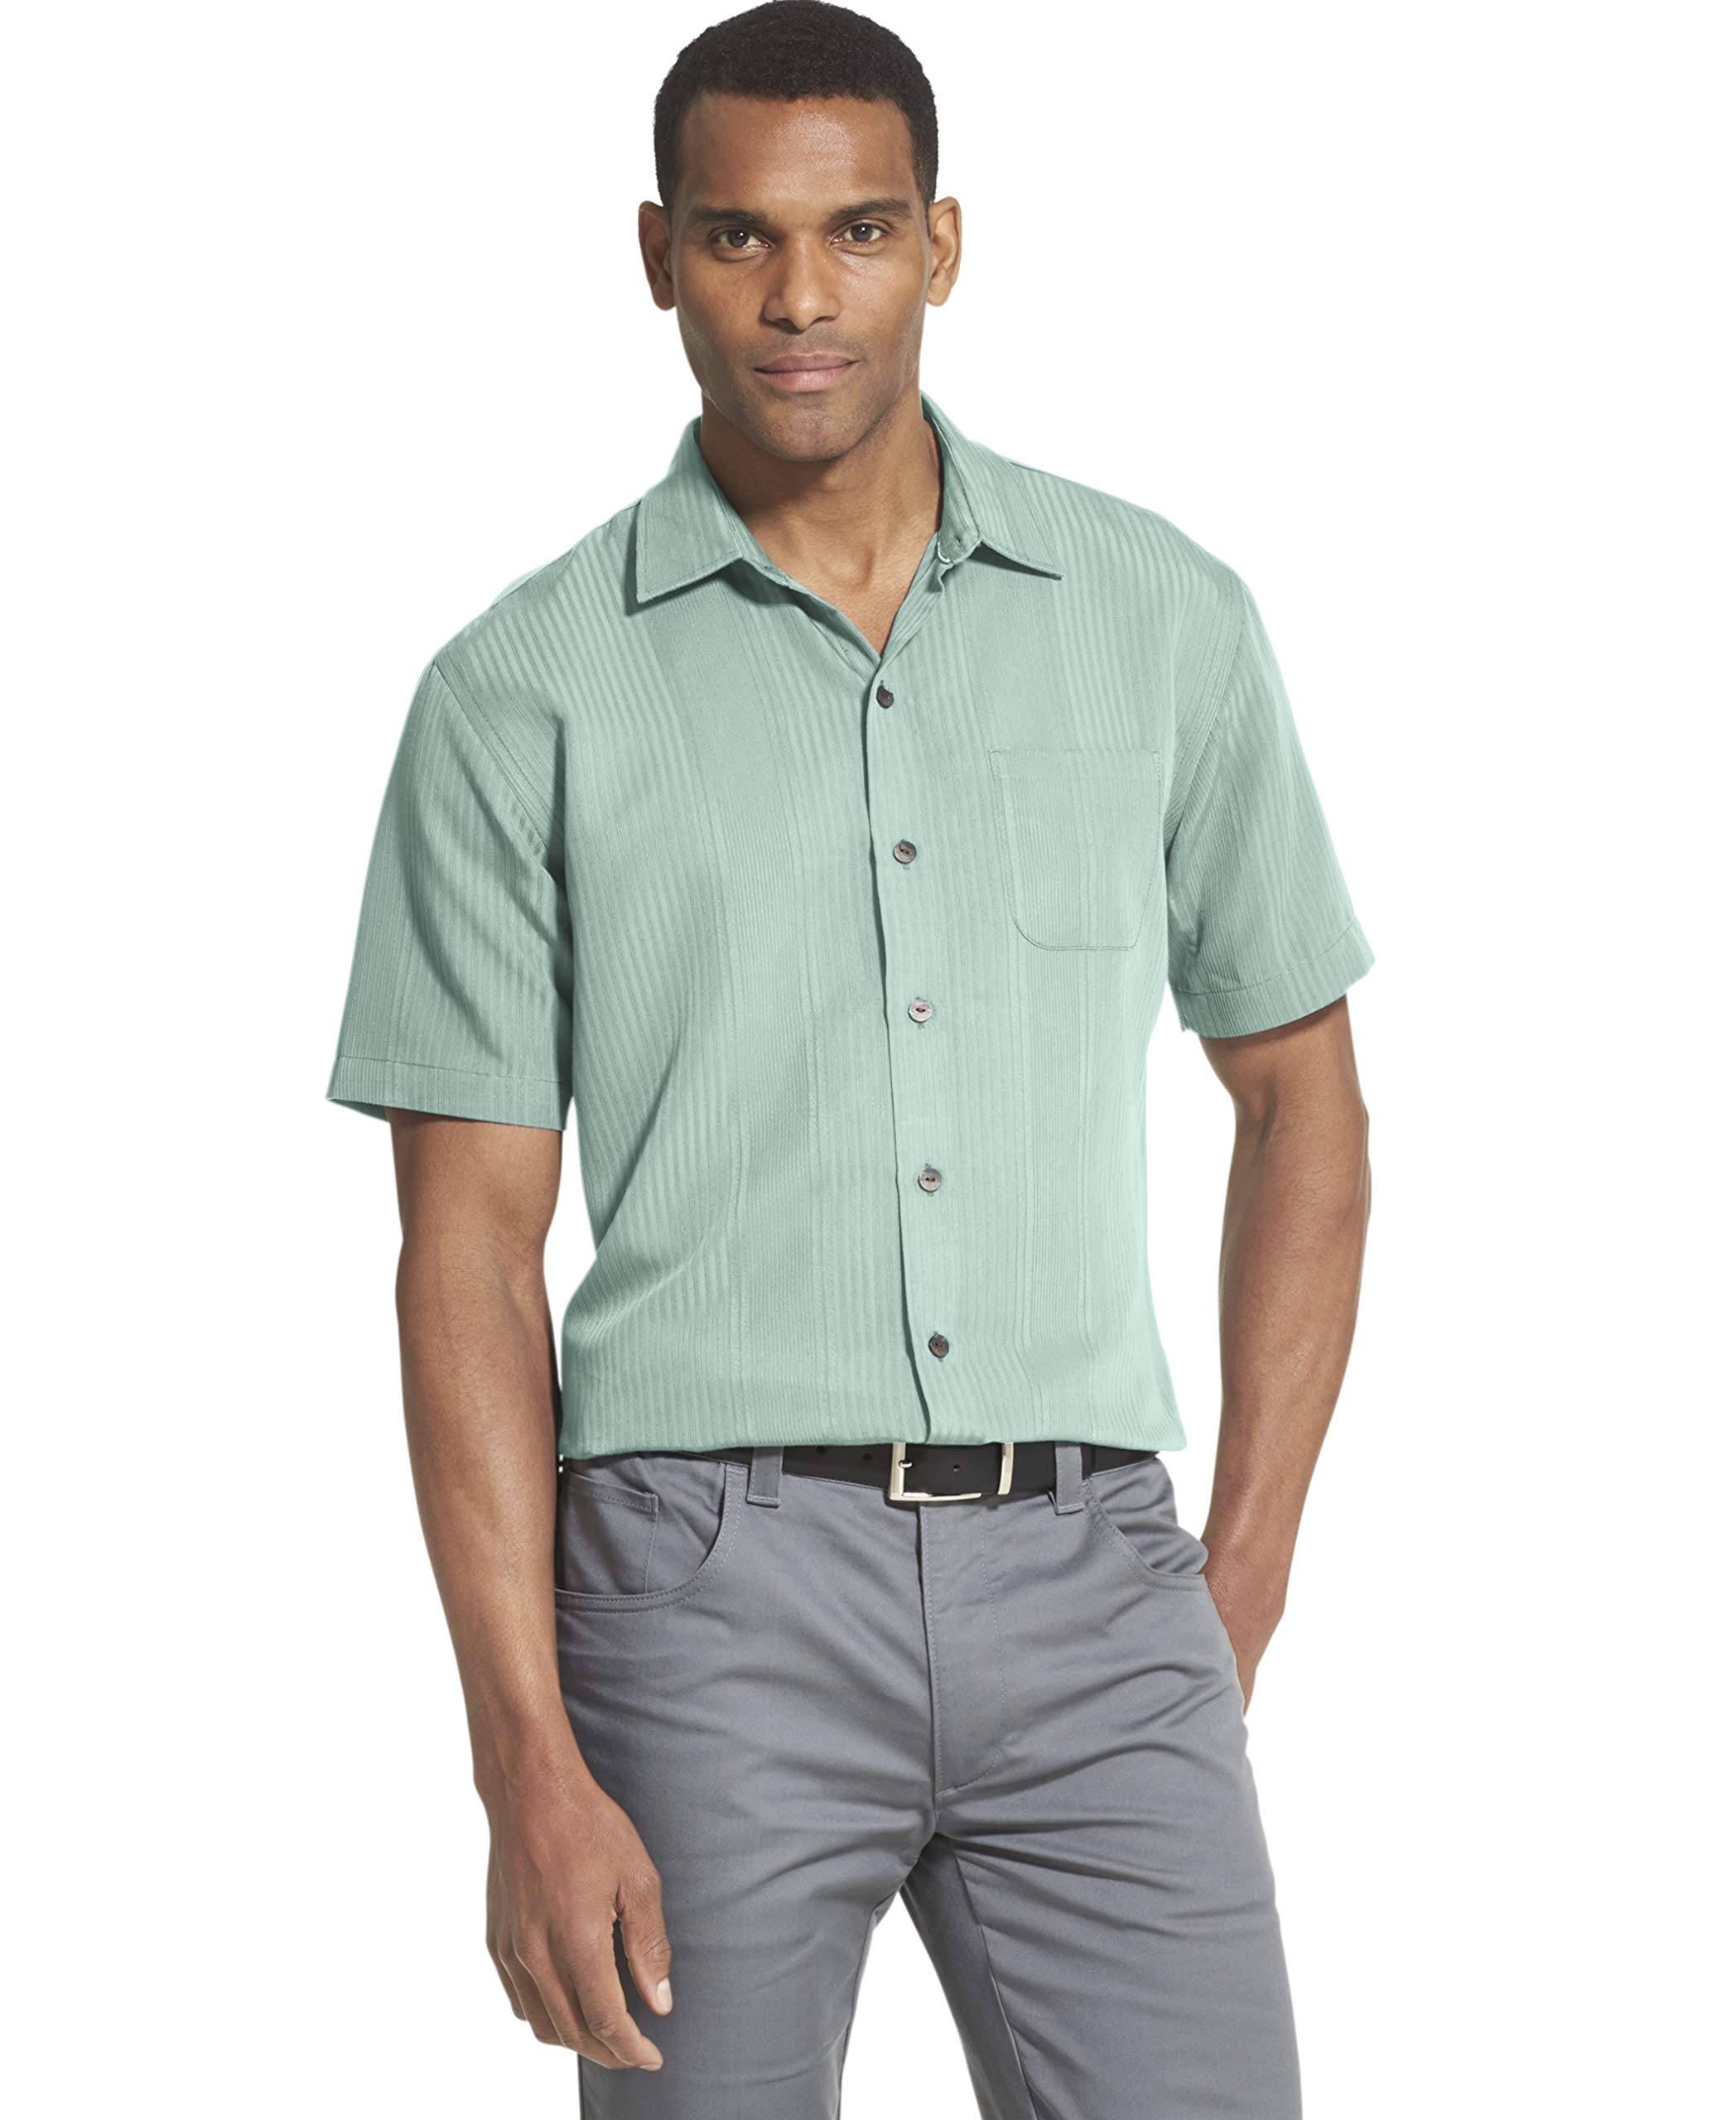 Van Heusen Men's Big and Tall Air Short Sleeve Button Down Poly Rayon Shirt (Discontinued)